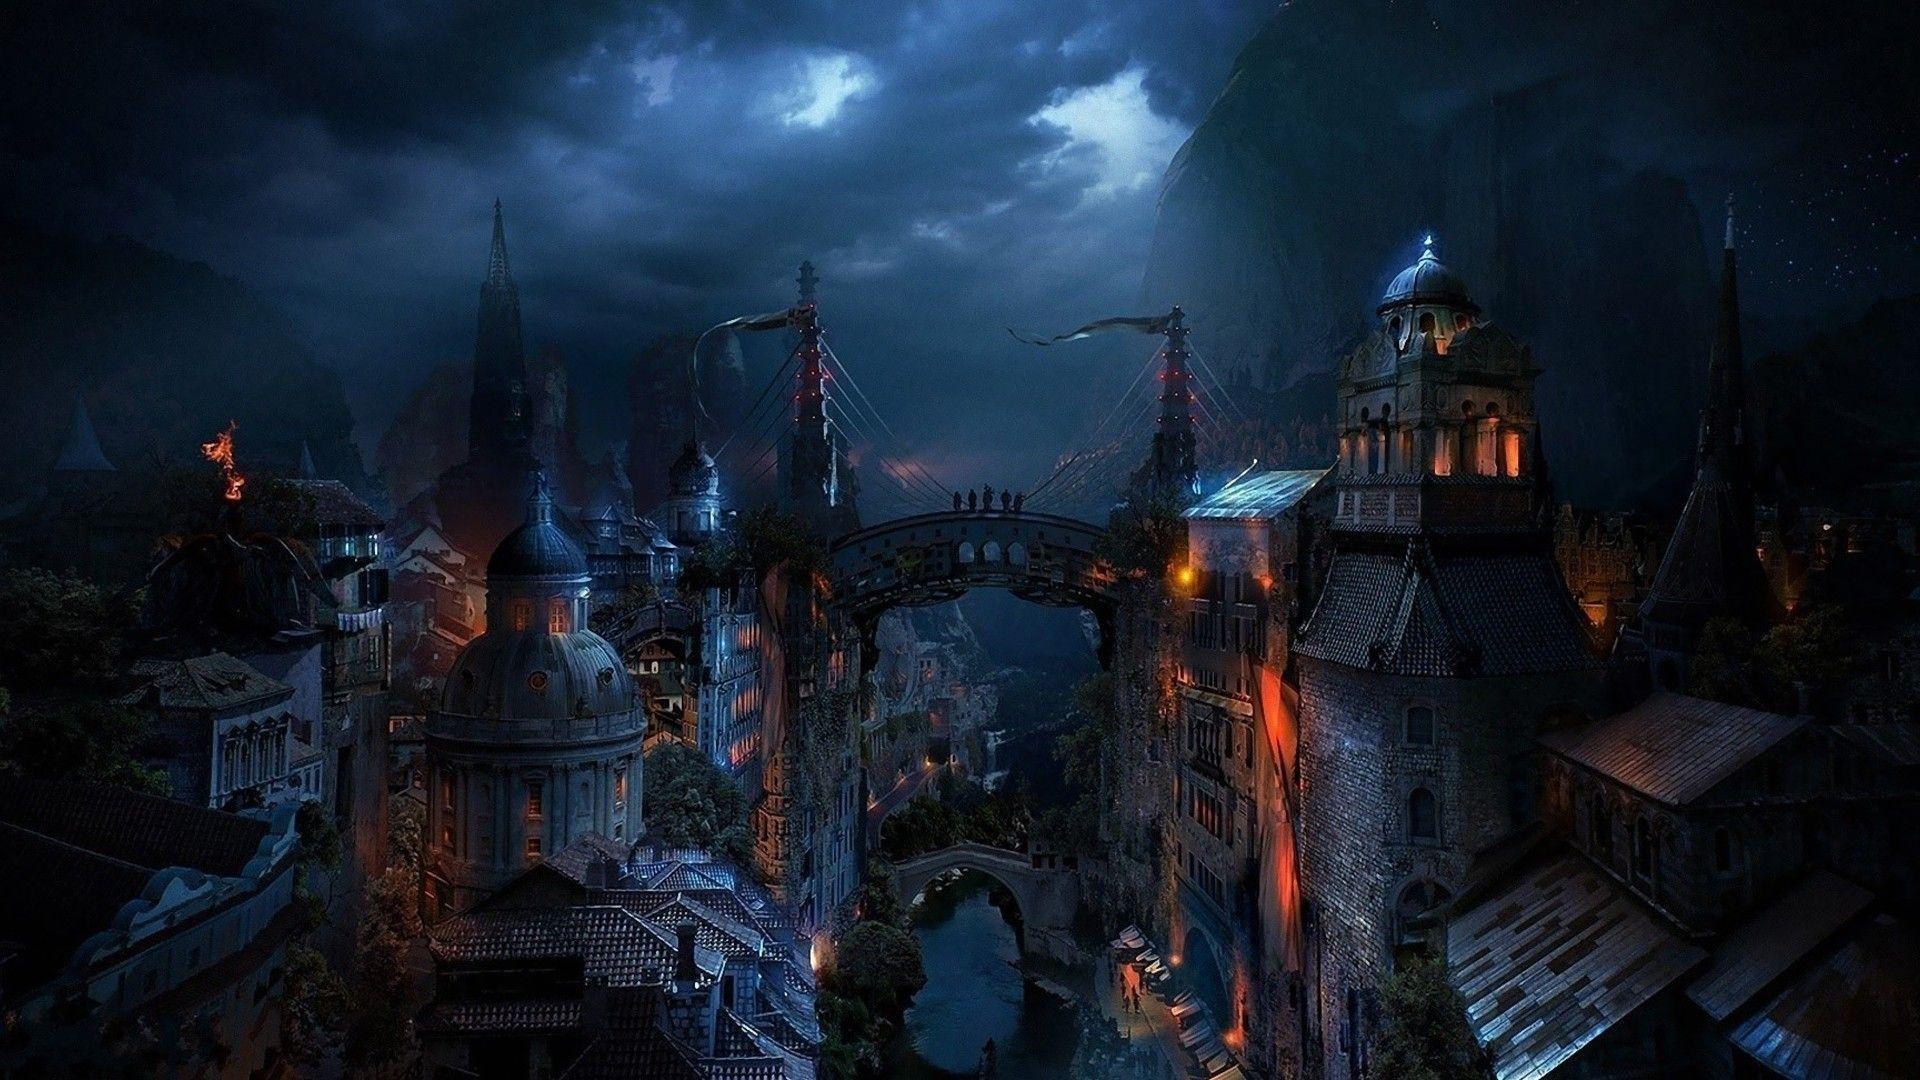 Http Www Fullhdwpp Com Wp Content Uploads Fantasy Cities Art 5 Www Fullhdwpp Com Jpg Fantasy City Dark City City Wallpaper